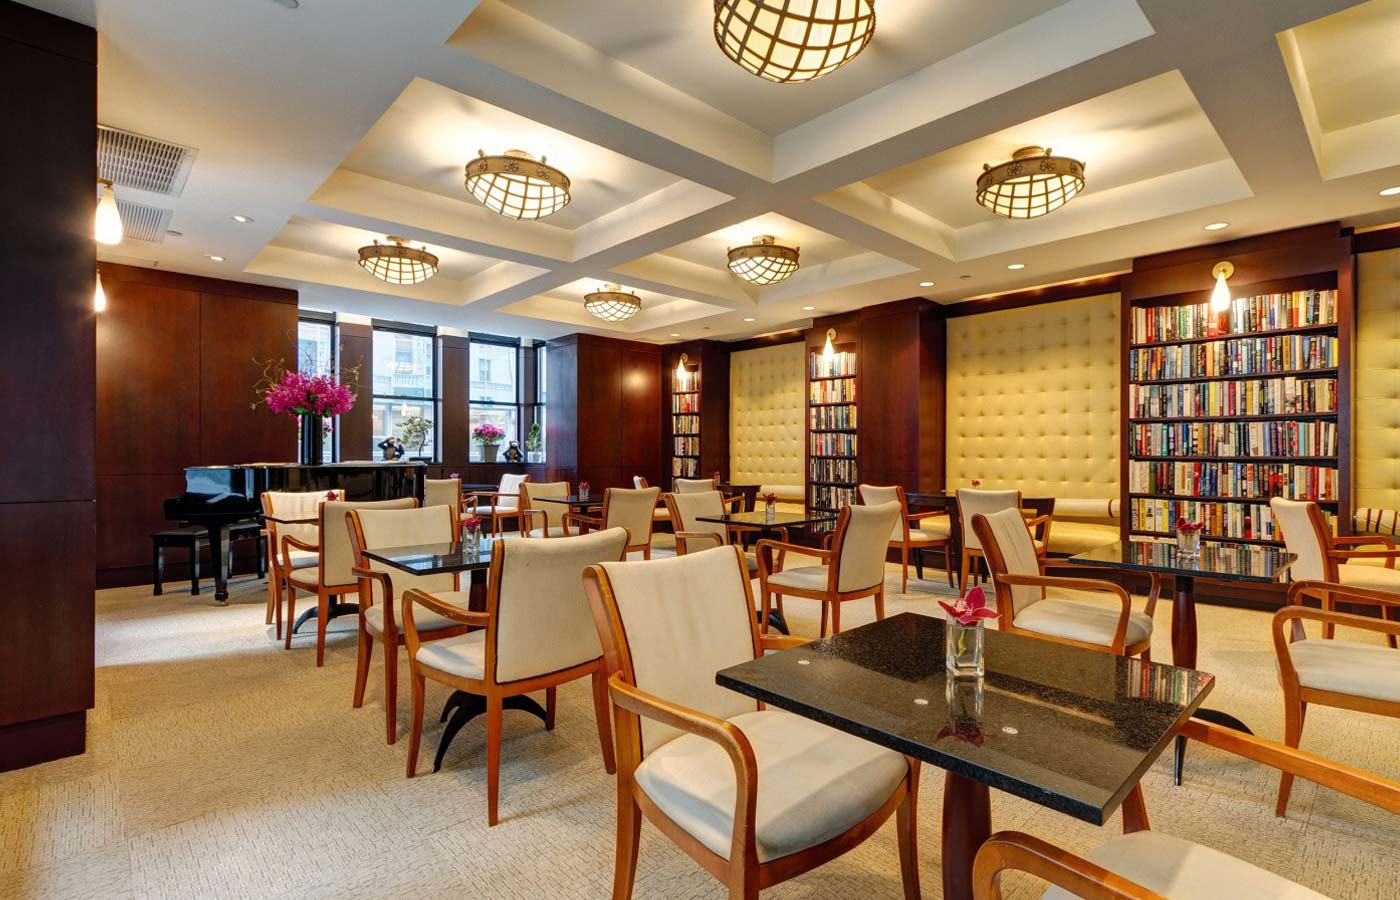 hoteles literarios library hotel New York-ruta-literaria-mientrasleo